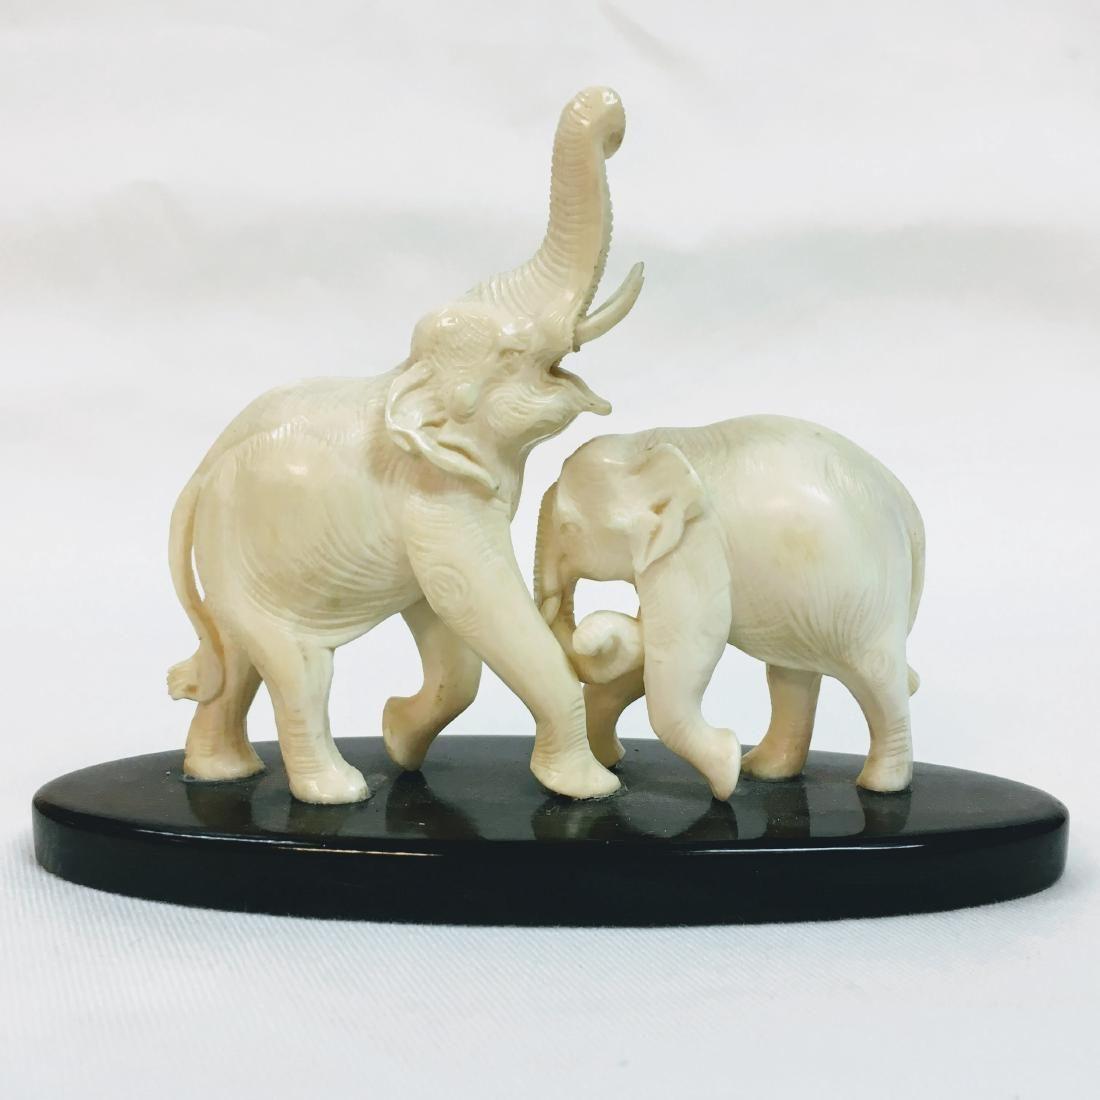 Handcarved two Elephant figure on base